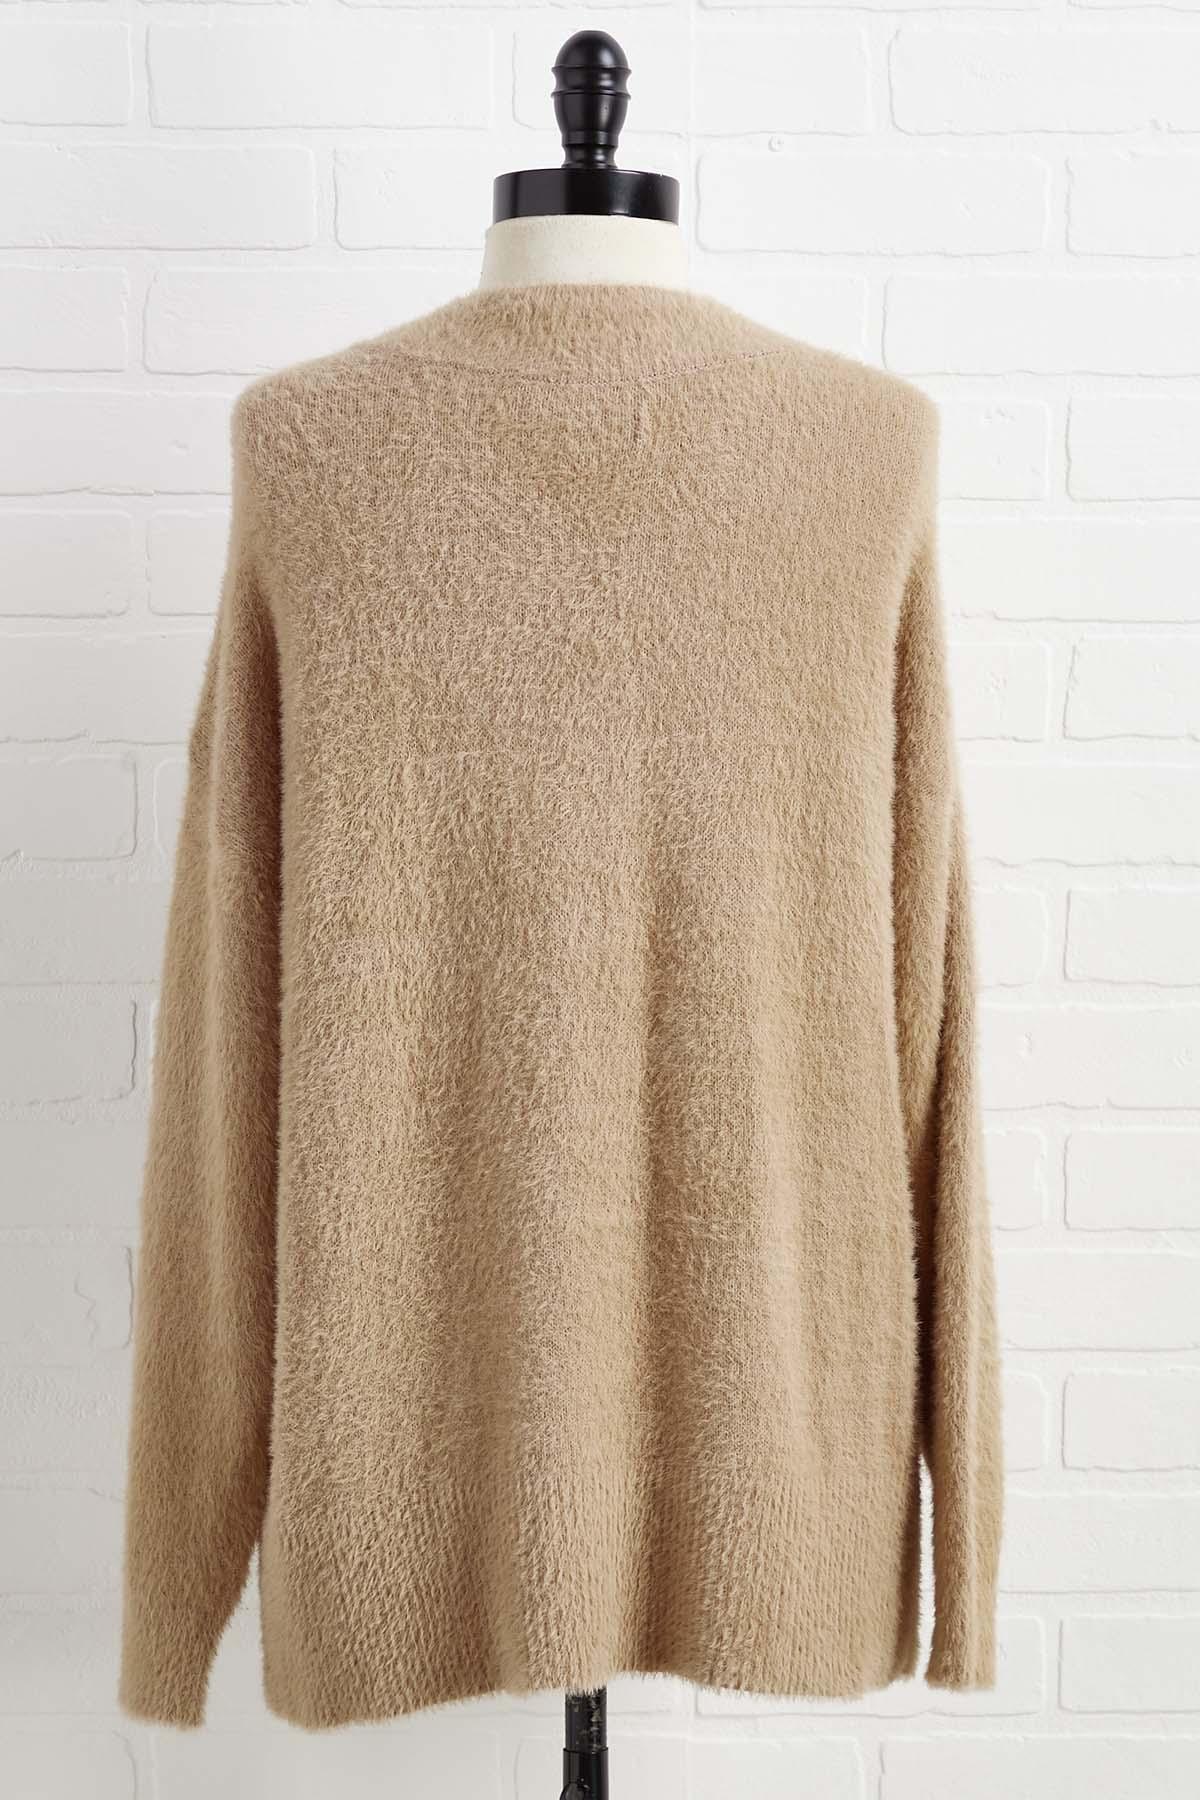 Chai Latte Sweater